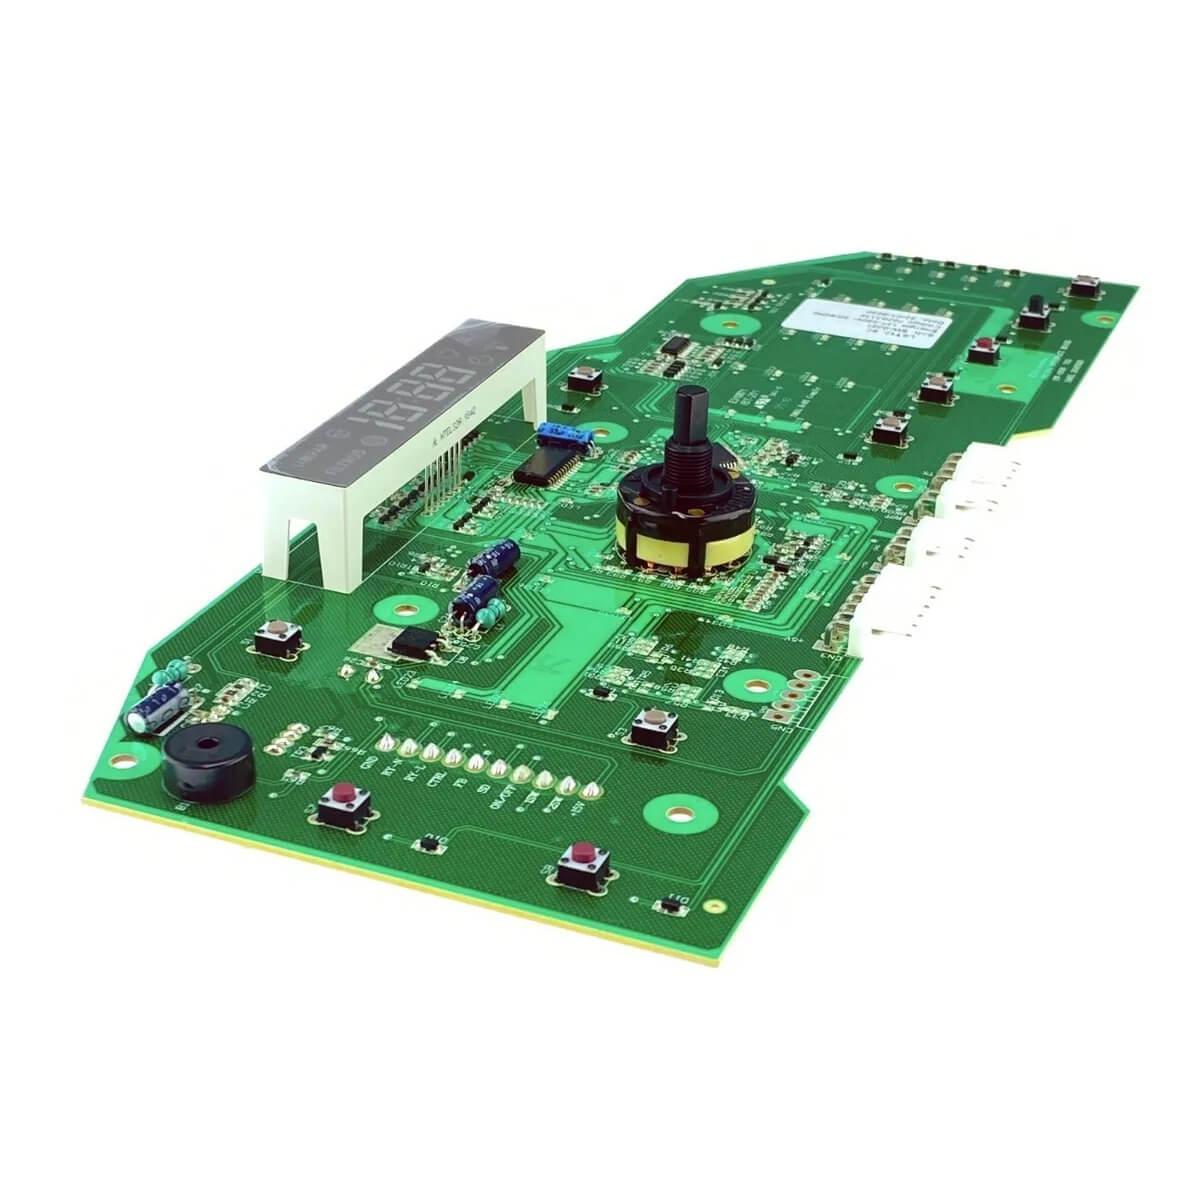 Placa Interface Eletrônica Para Lavadora De Roupas LST12 Electrolux - 70203339 A99408304